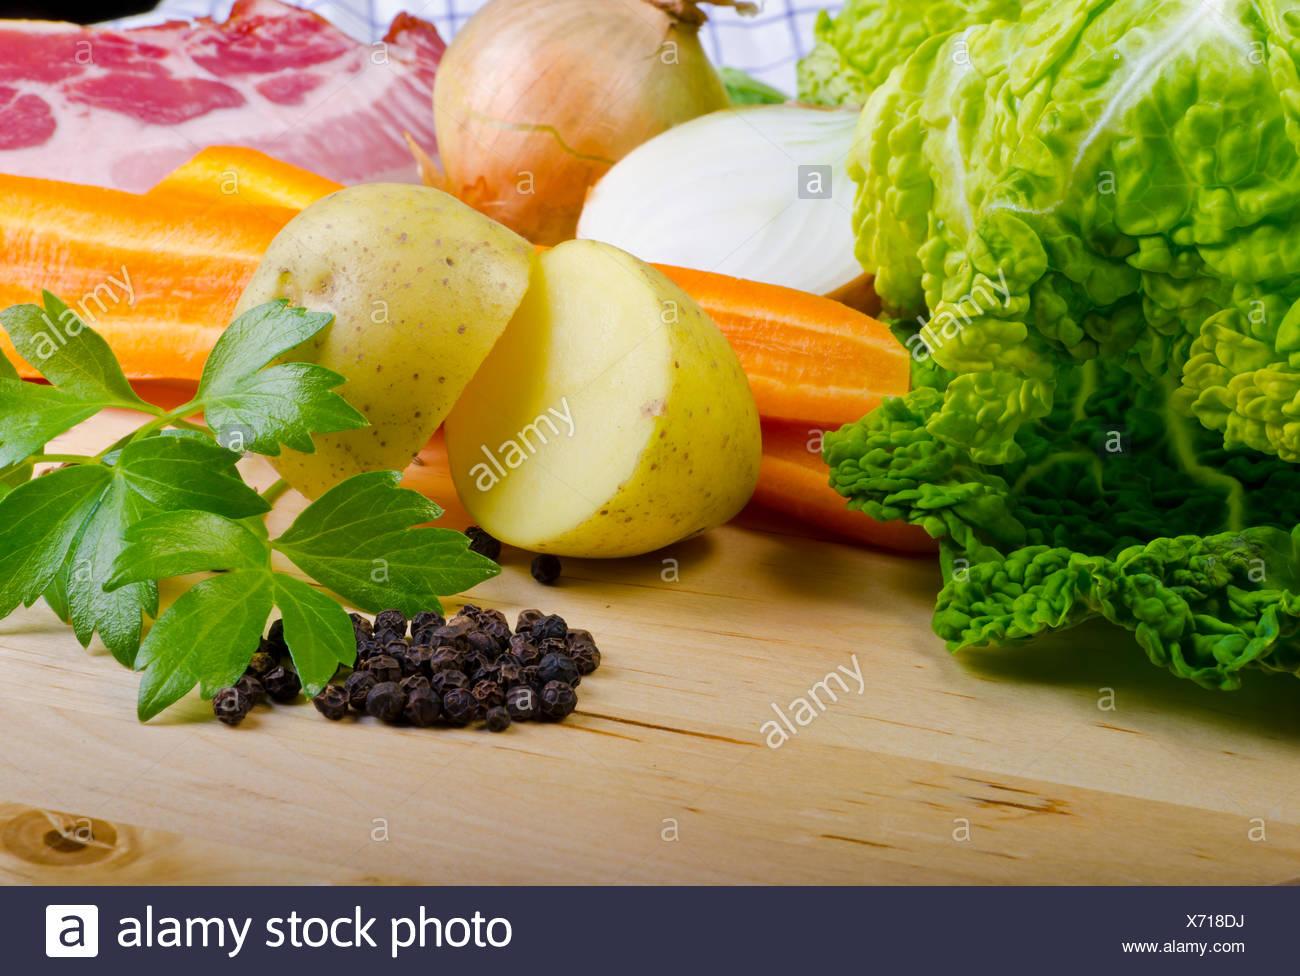 food aliment vegetable cabbage savoy broths soups potato potatoe food aliment eco kitchen cuisine vegetable cabbage vital savoy - Stock Image